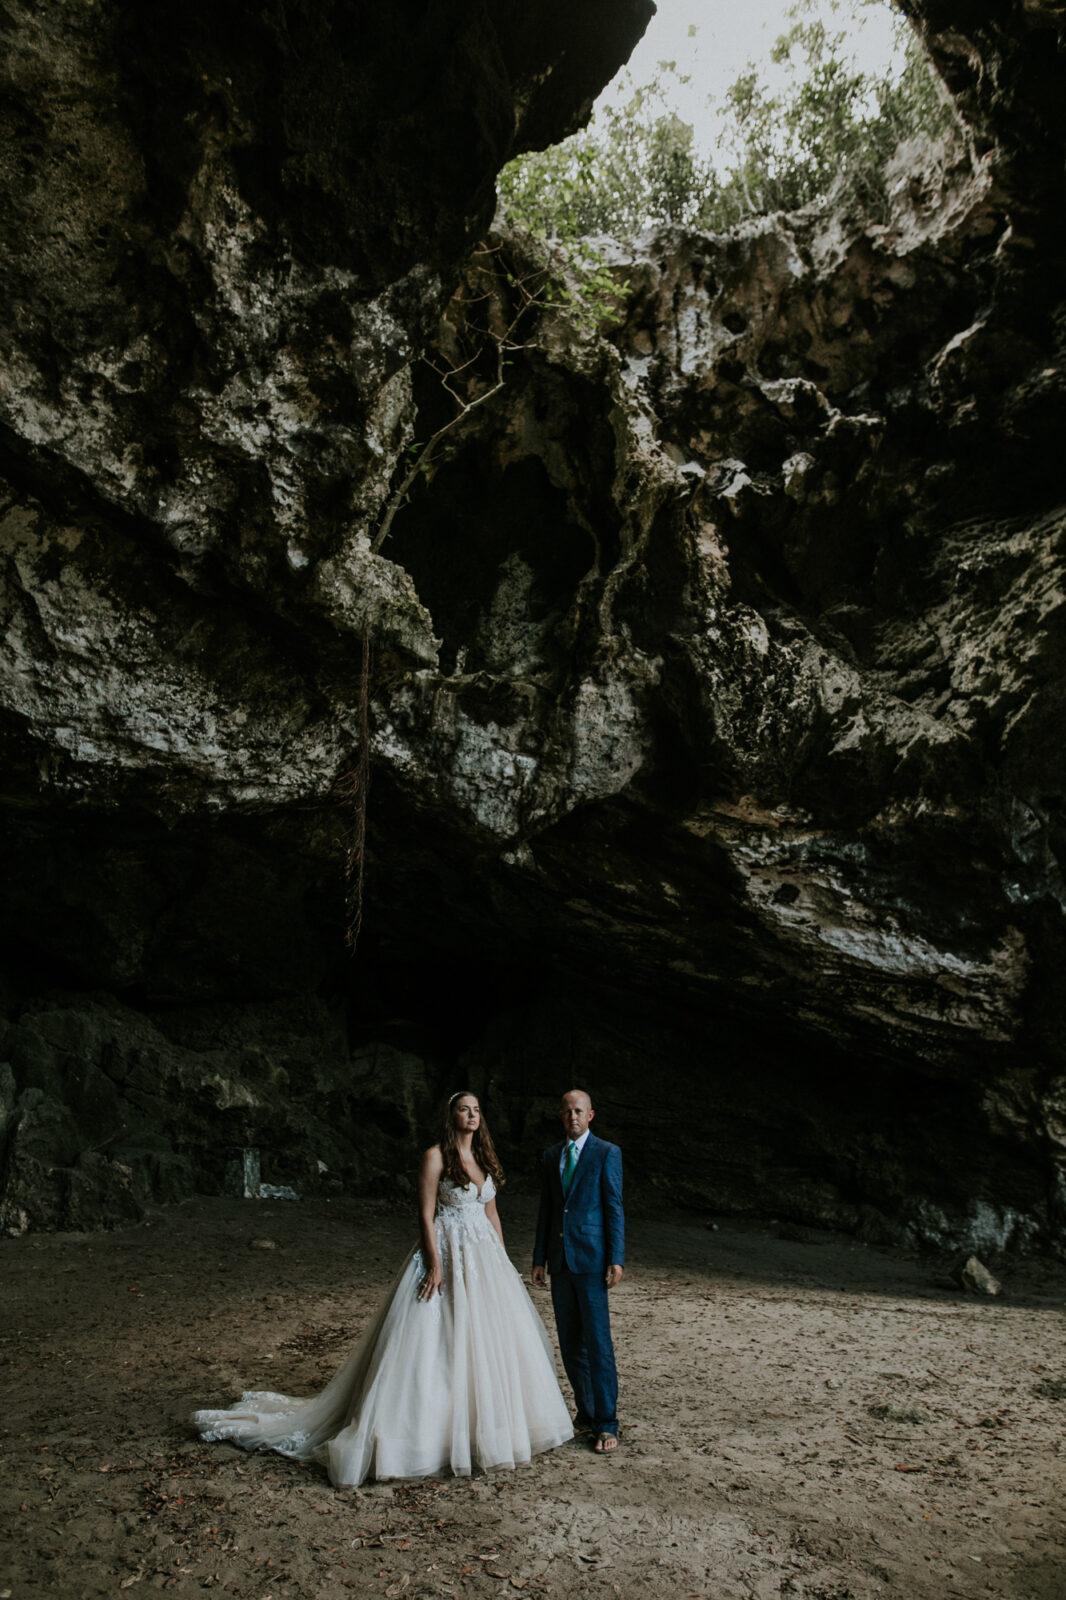 eleuthera elopement at preachers cave